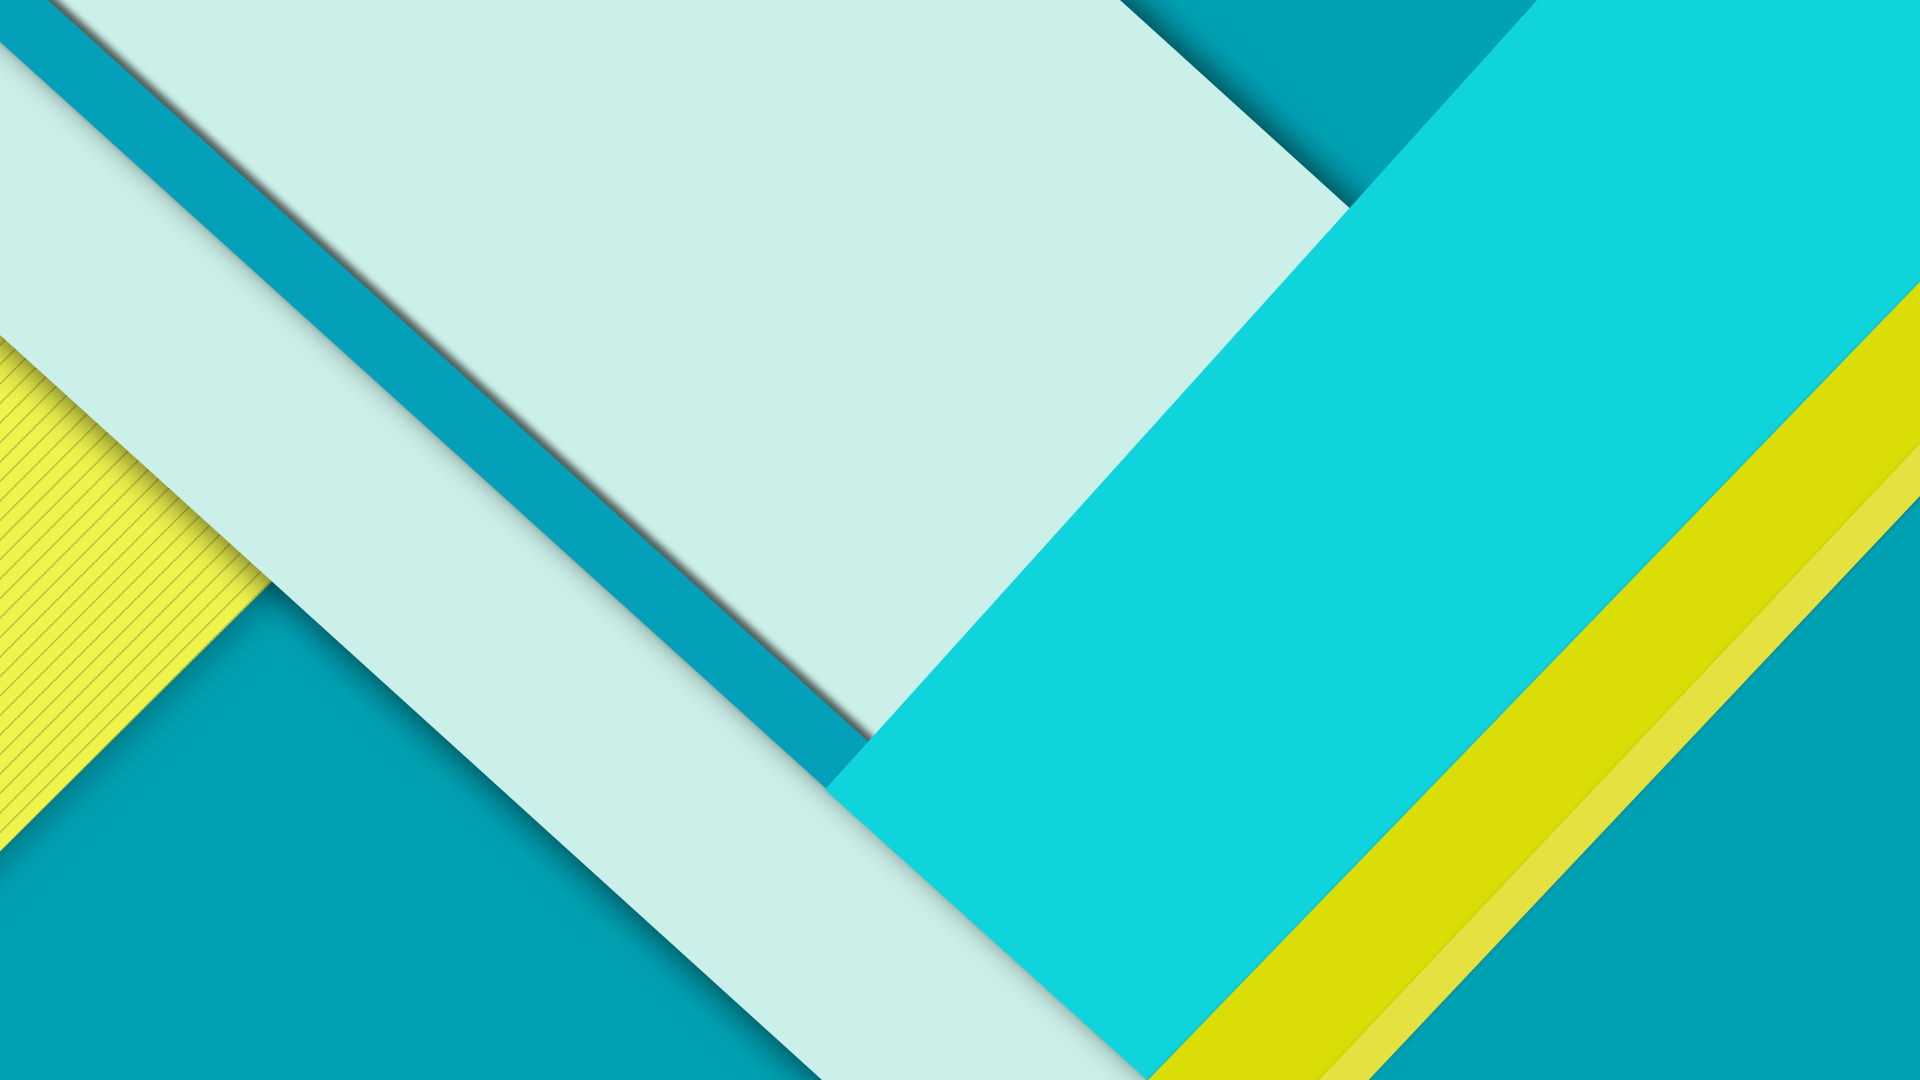 40 Best Material Design Wallpapers 4K 2016 HD Windows 7 8 10 1920x1080